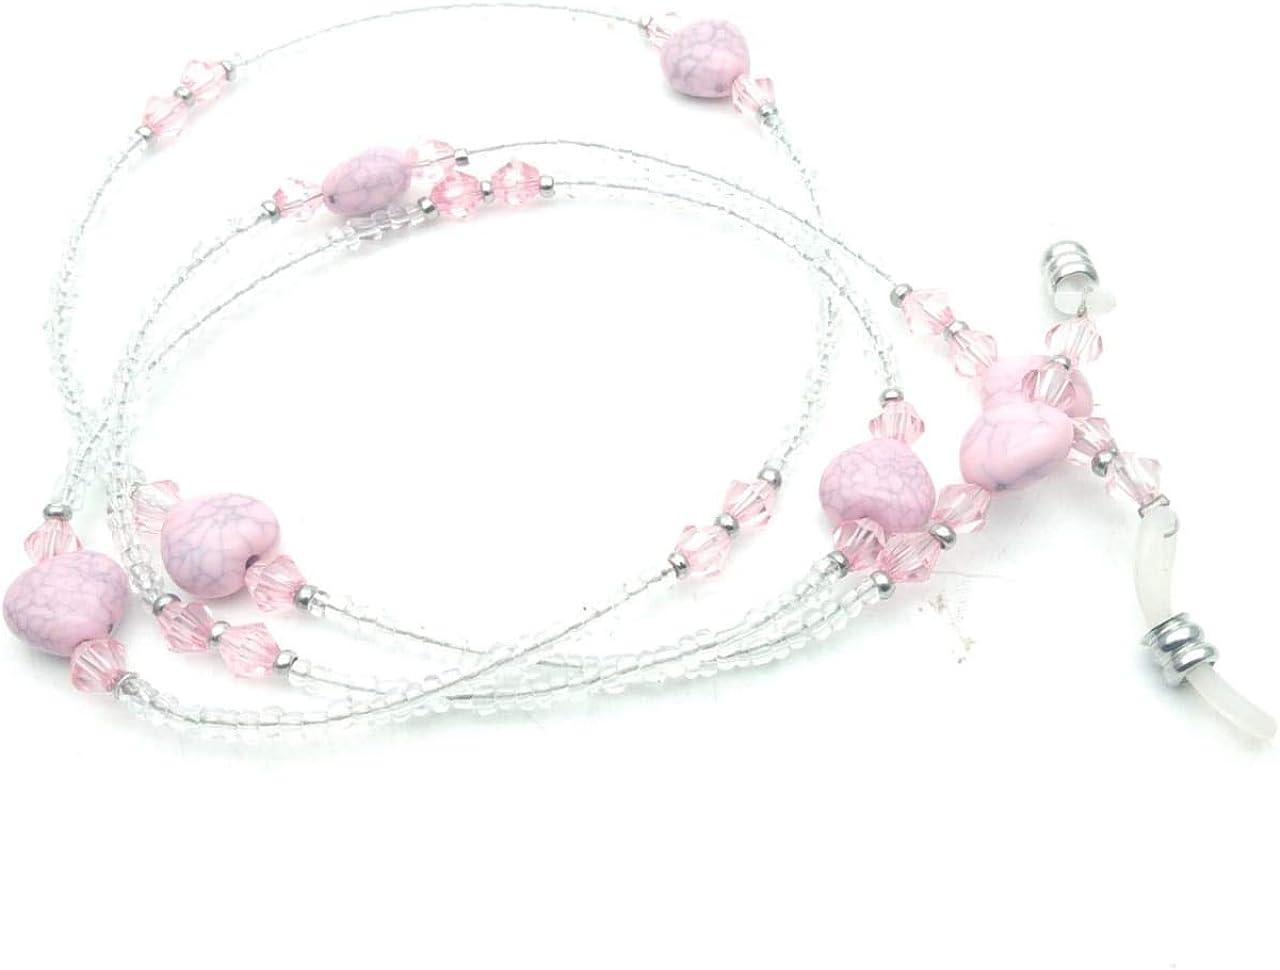 RSINC Eyeglass Chain Holder Fake Pink (Pink) Color Beaded Spectral Cord Non-slip Sunglass Chain Metal Alloy Holder Cord 70cm For Men, Women, Children